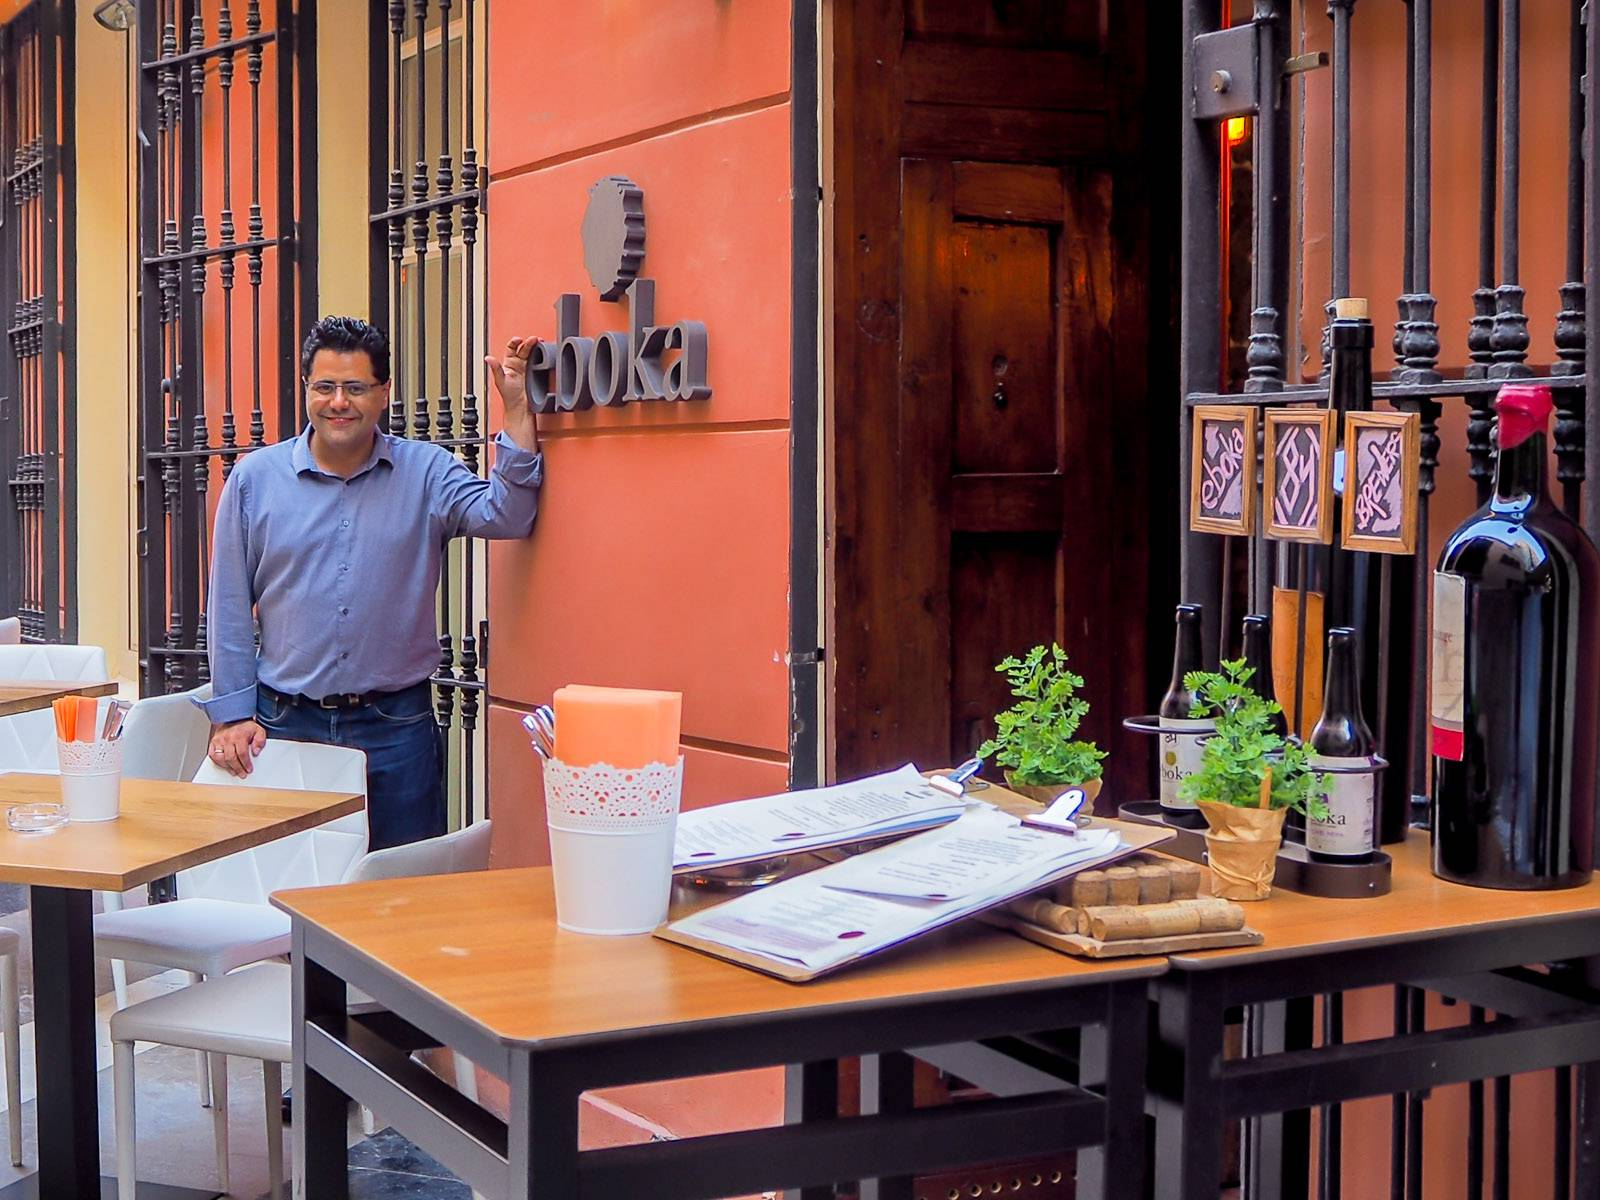 Oferta de empleo para camarero en Eboka restaurante del centro de Málaga